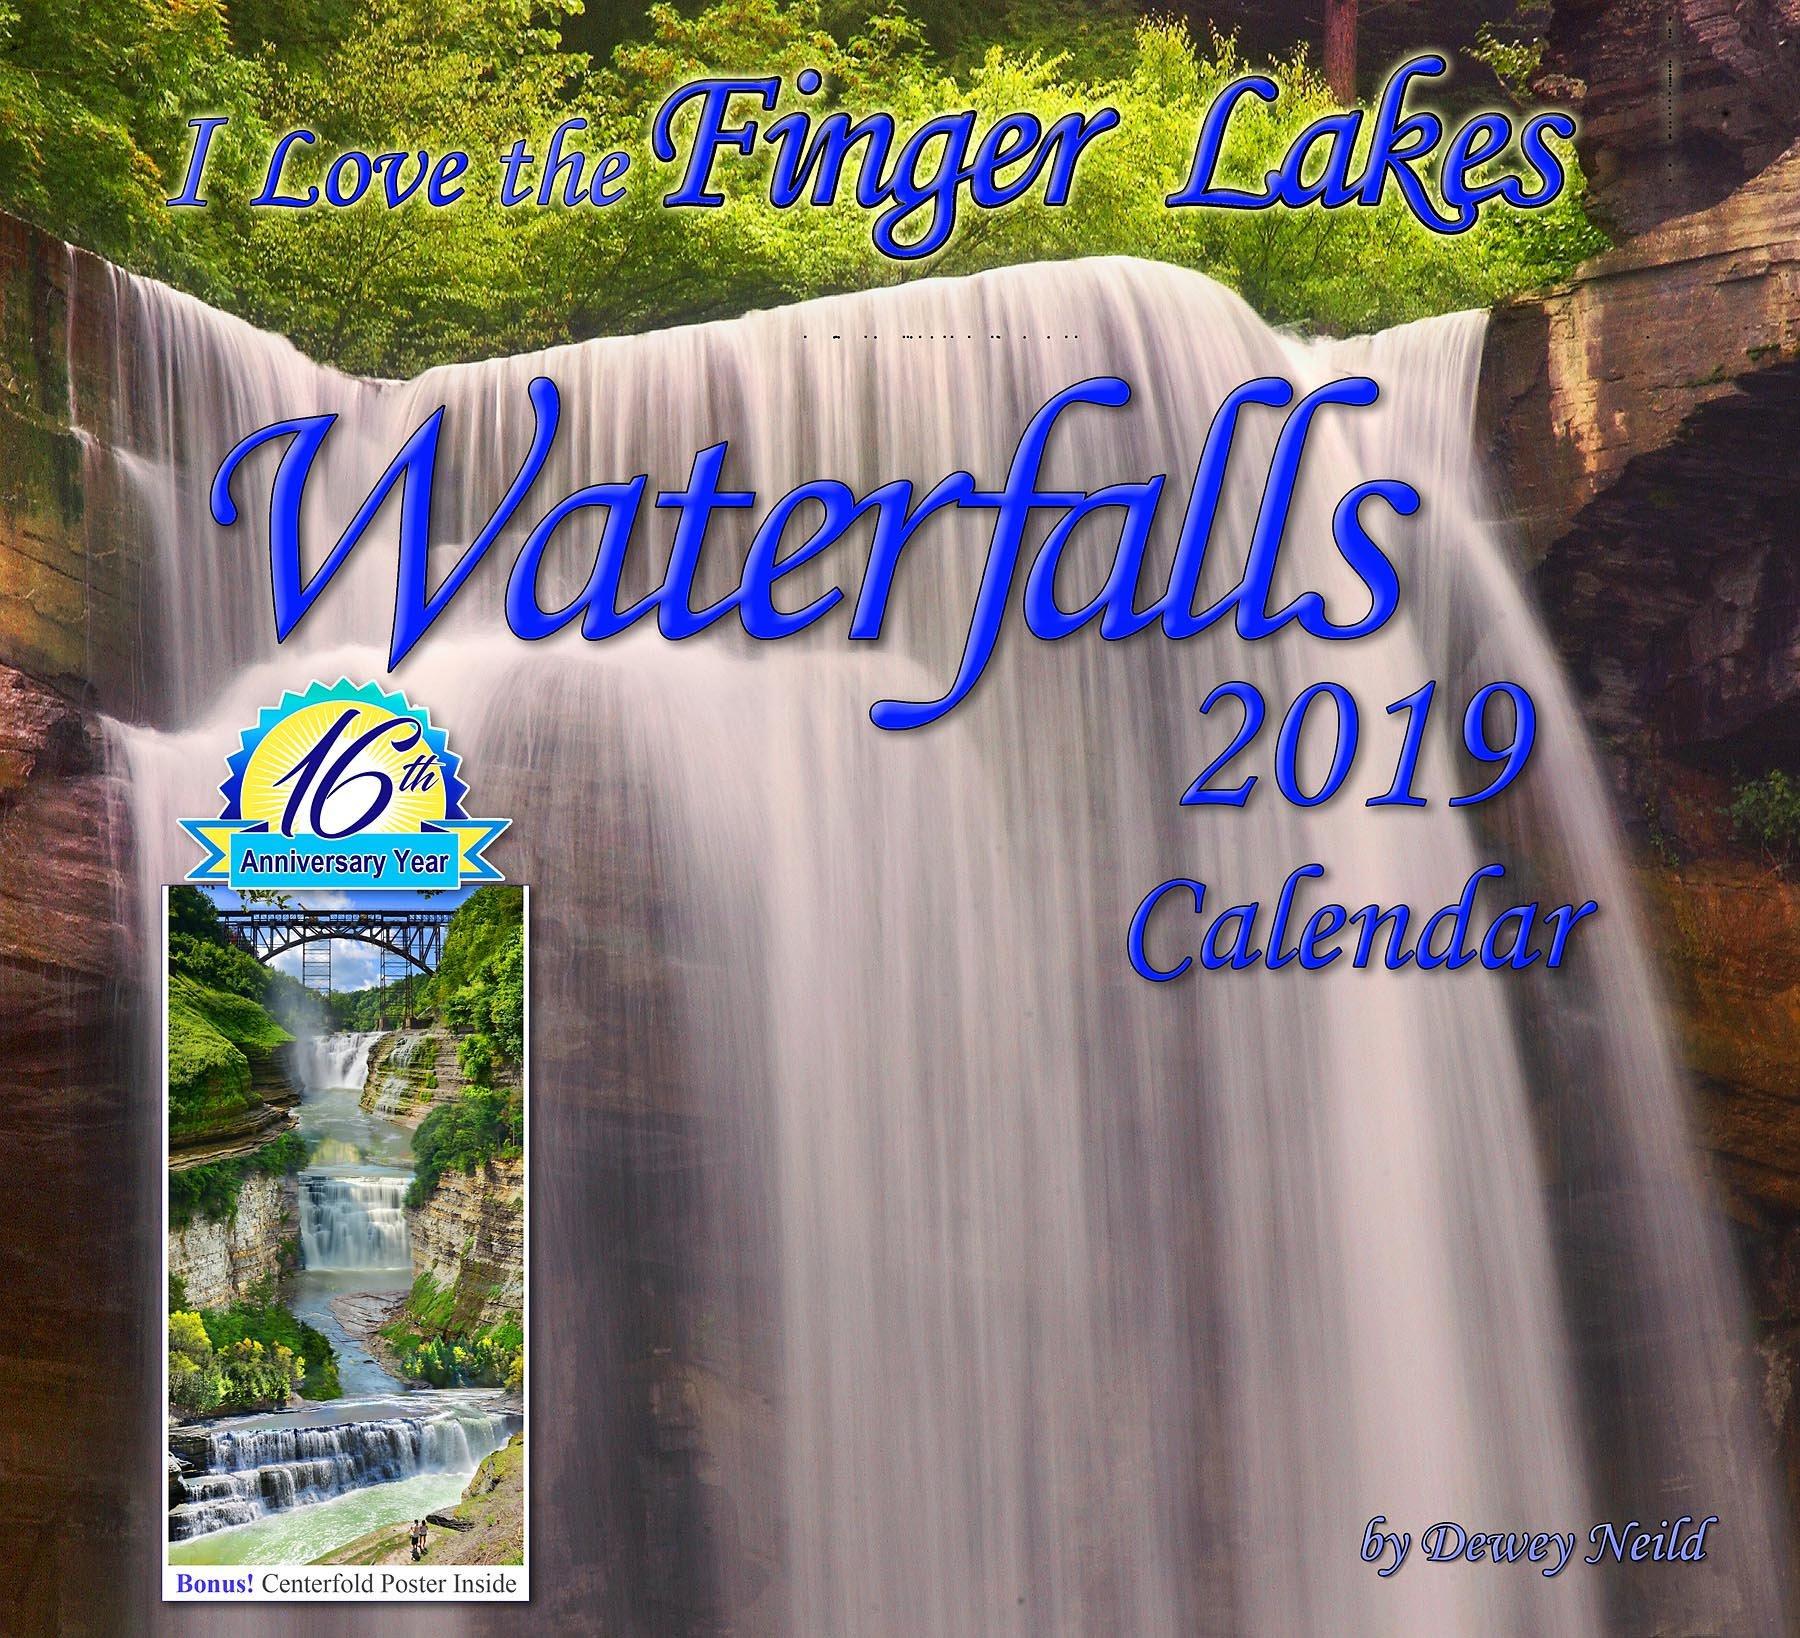 Finger Lakes Waterfalls 2019 Calendar